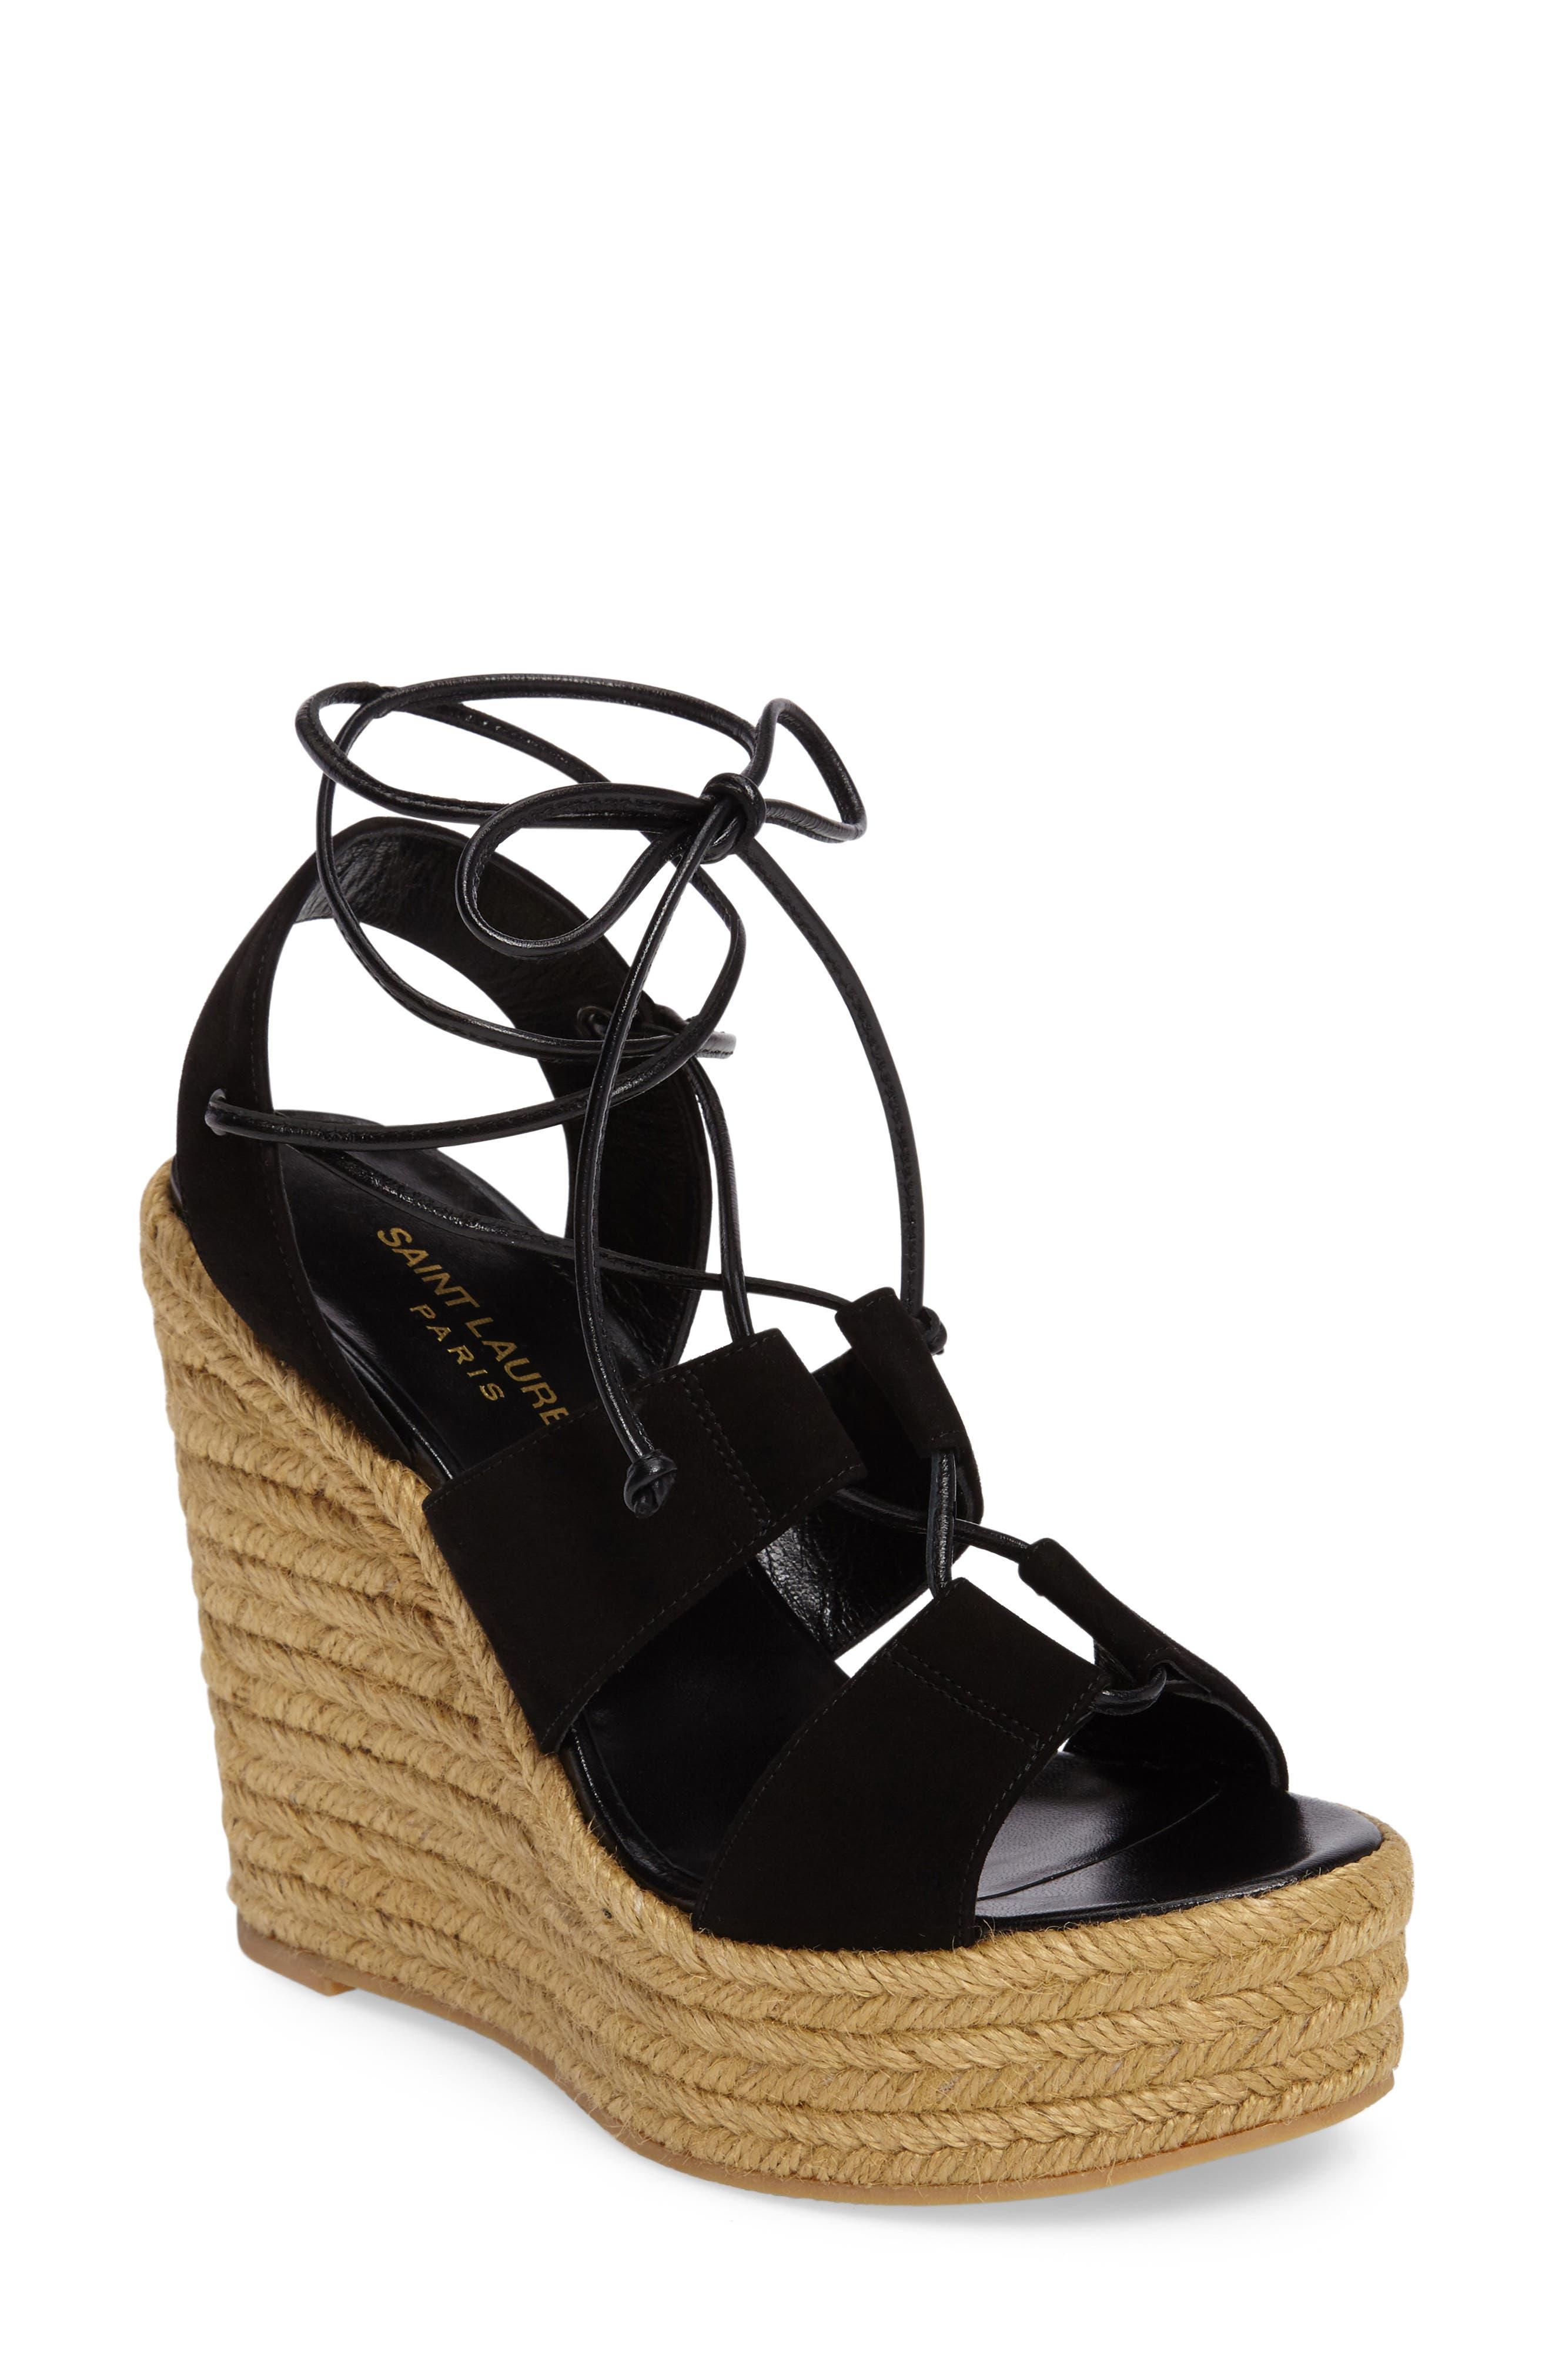 Woven Espadrille Wedge Sandal,                         Main,                         color, 001